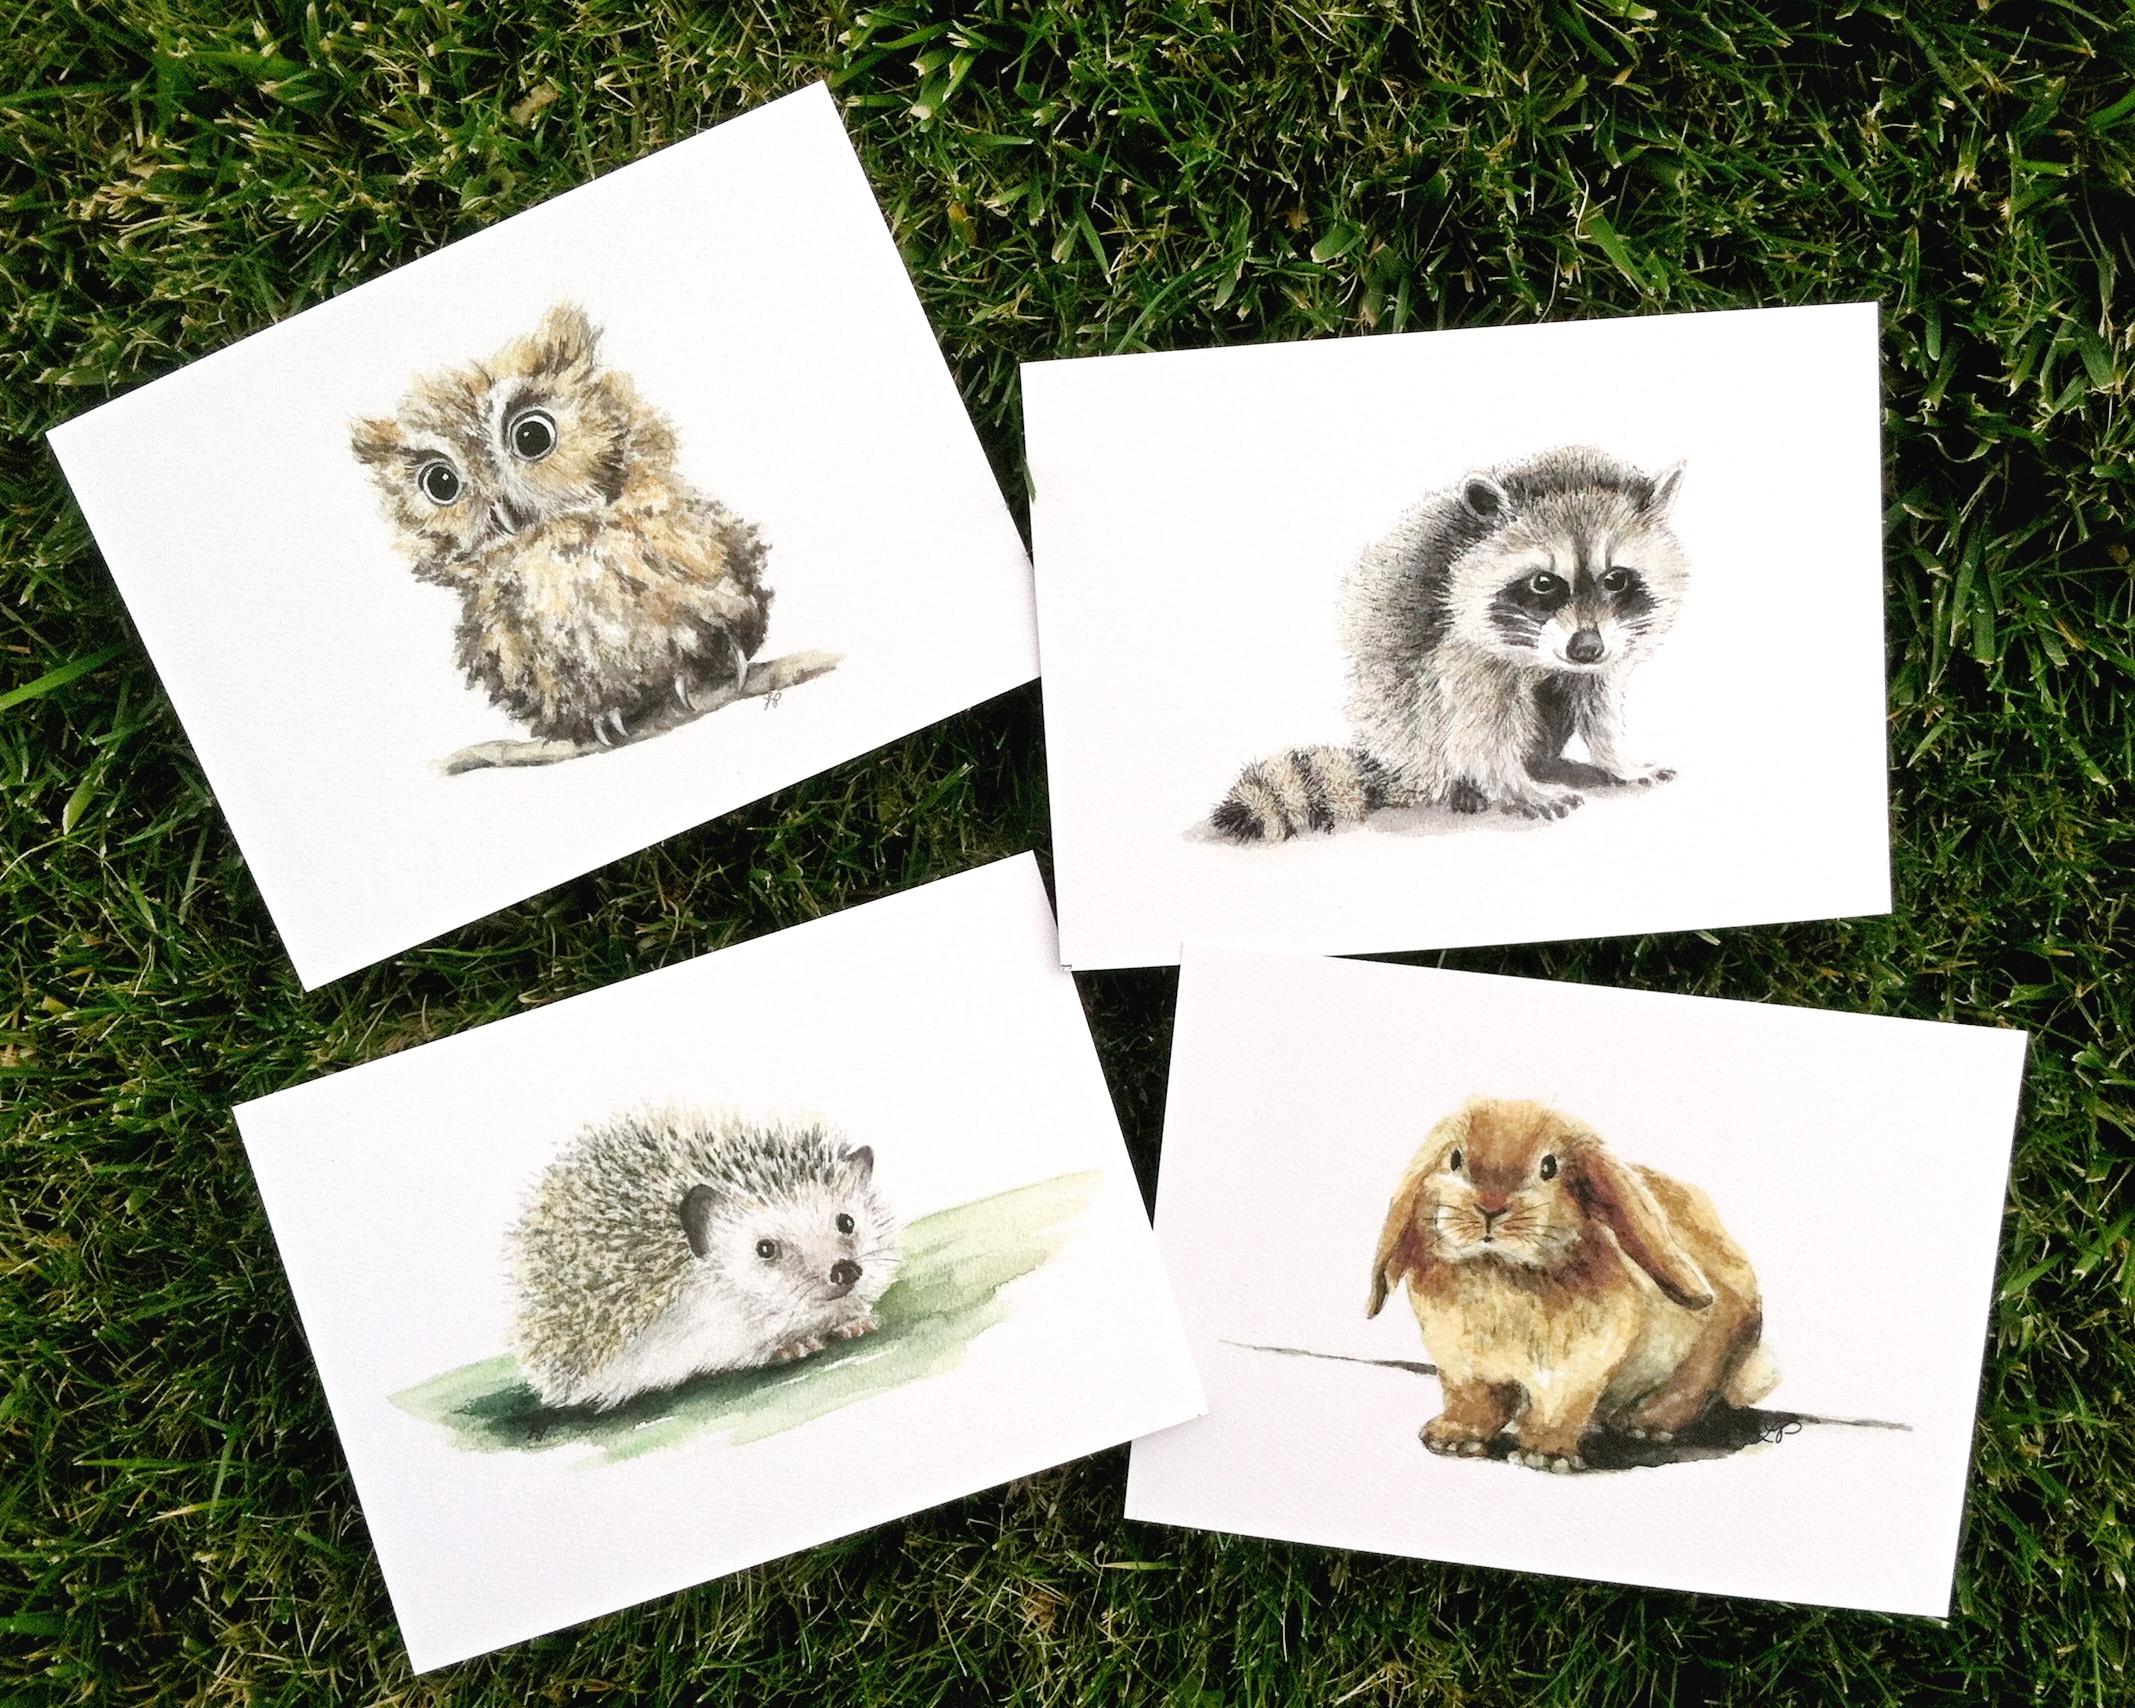 WOODLAND BABIES - Owl, Raccoon, Hedgehog, and Bunny - SIZE: 5 X 7